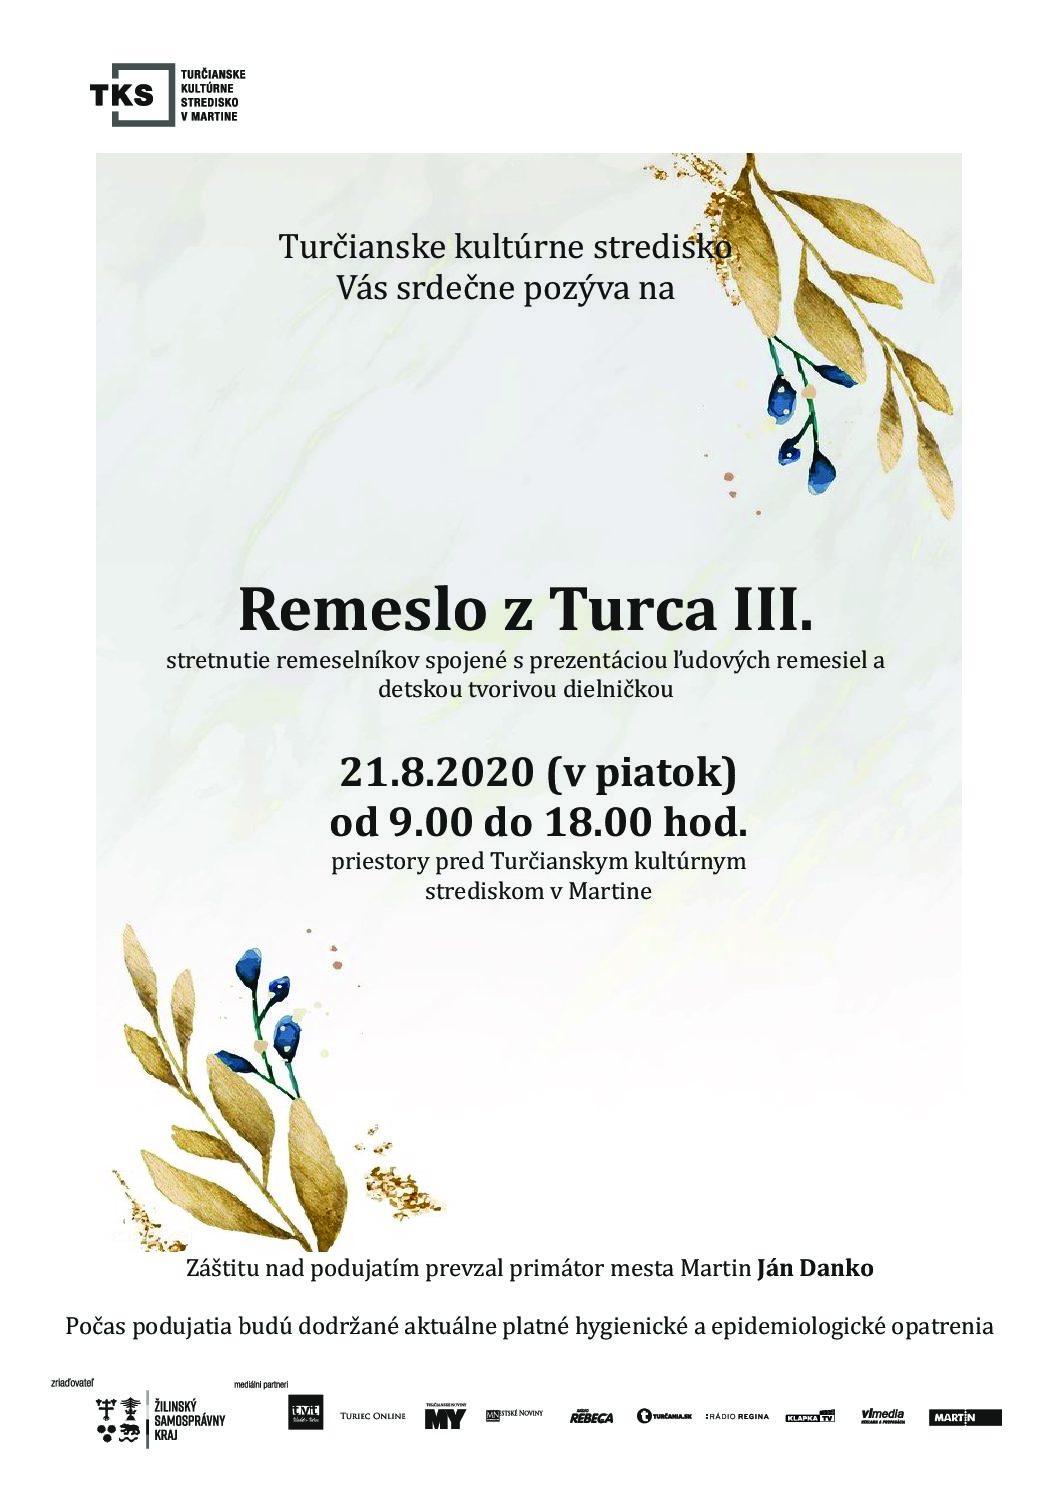 Remeslo z Turca III.